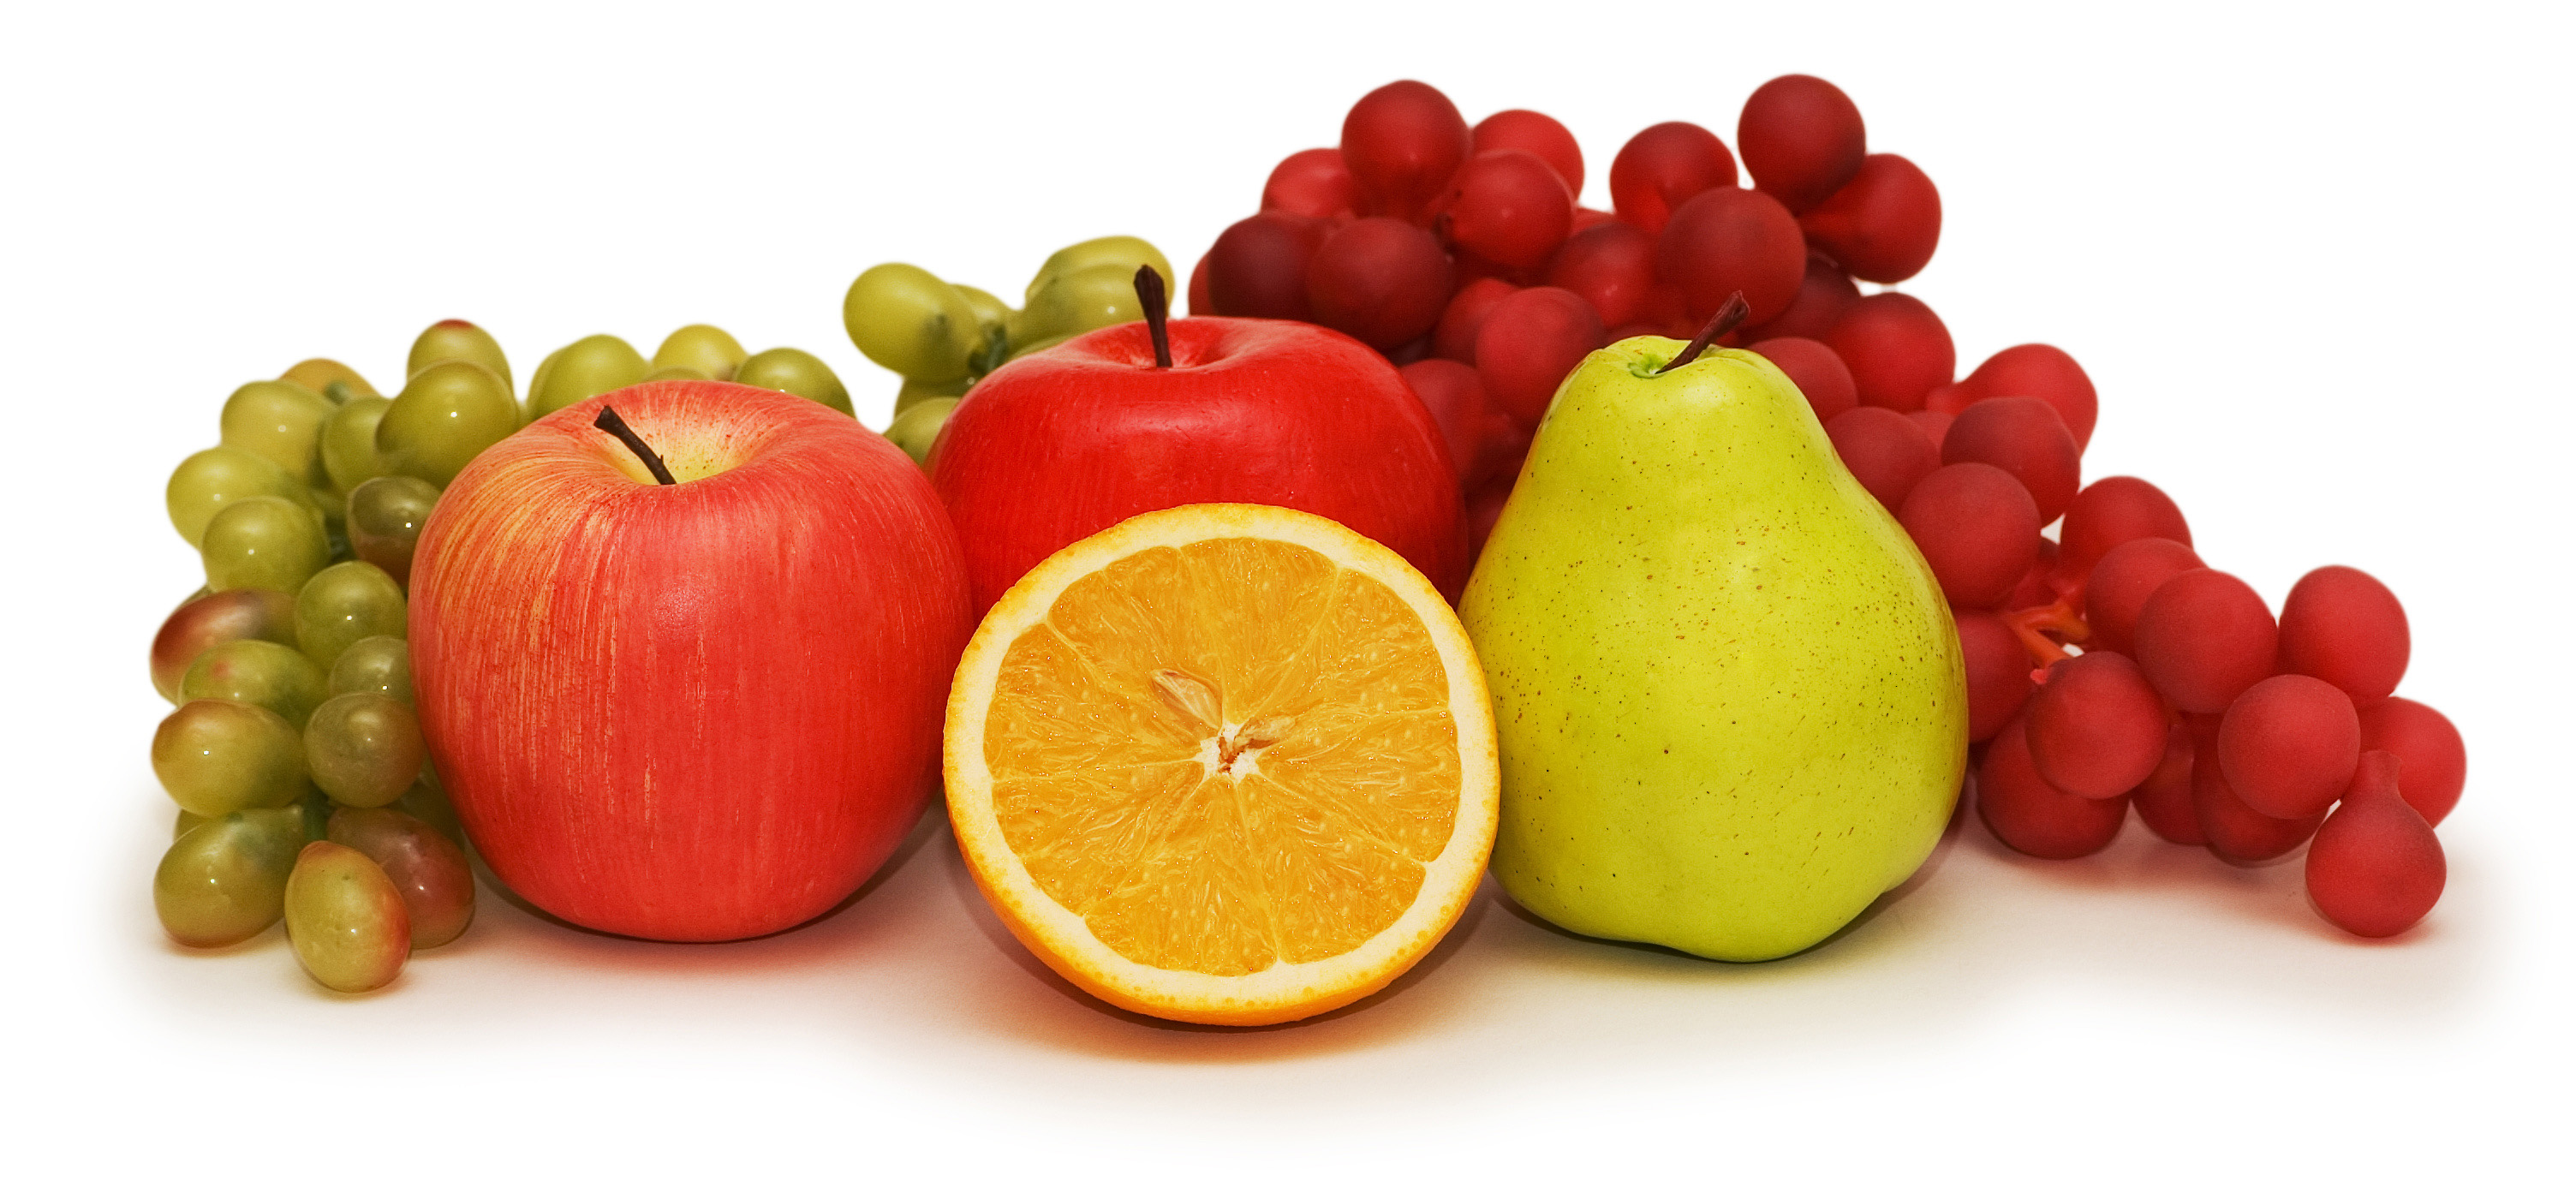 frutas-deita-gay-passivo-sexo-anal